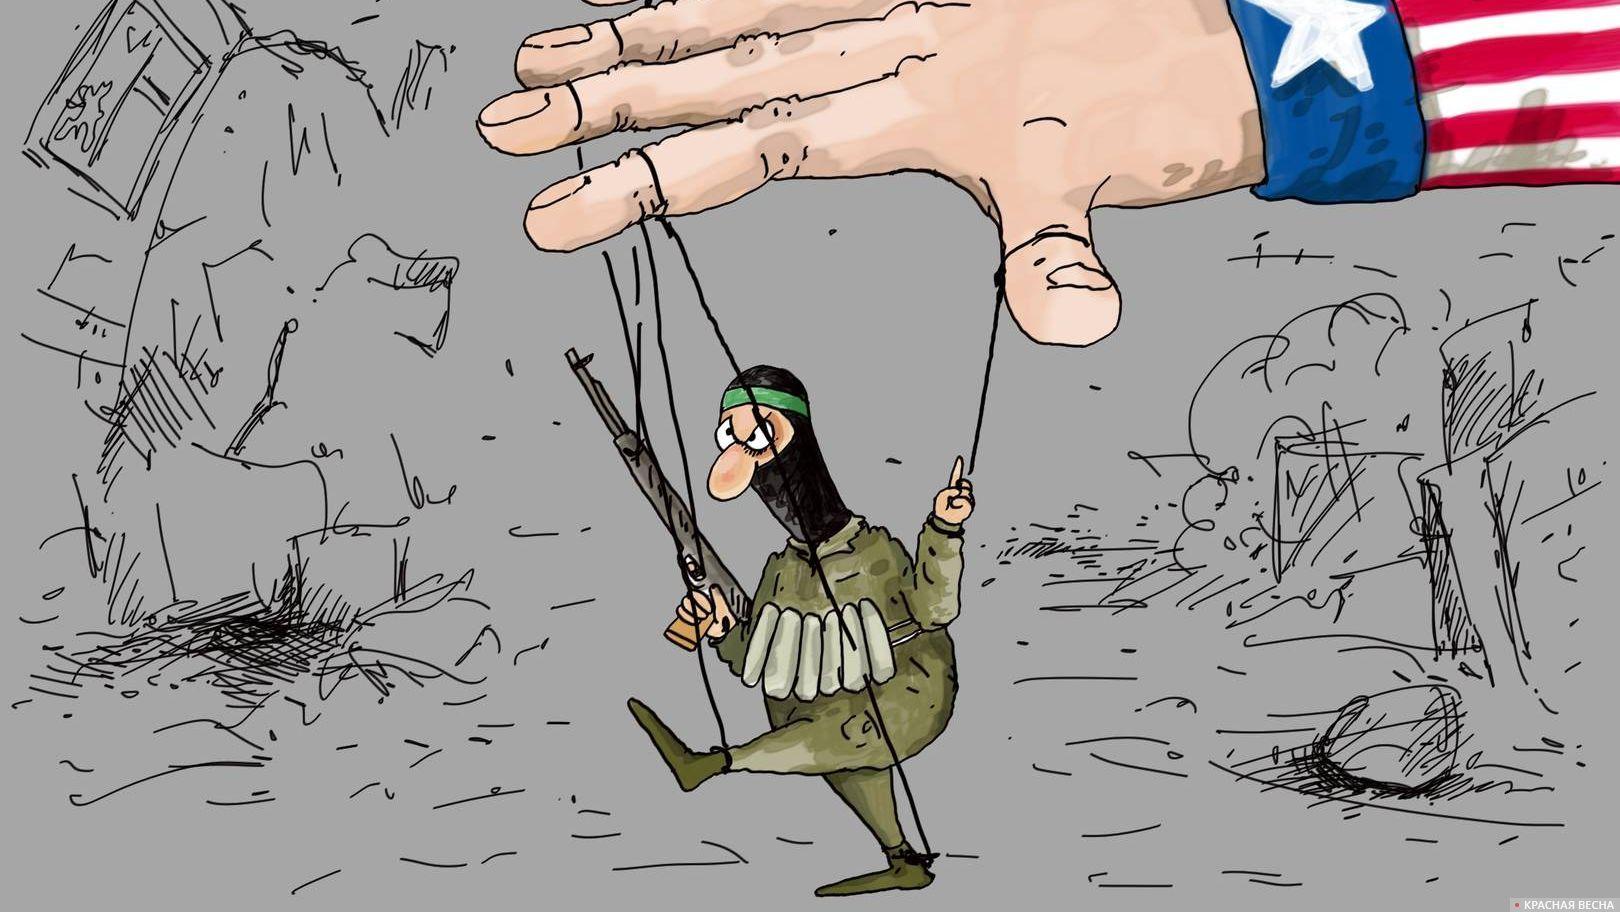 ООН приняла приглашение на съезд сирийского государственного разговора вСочи